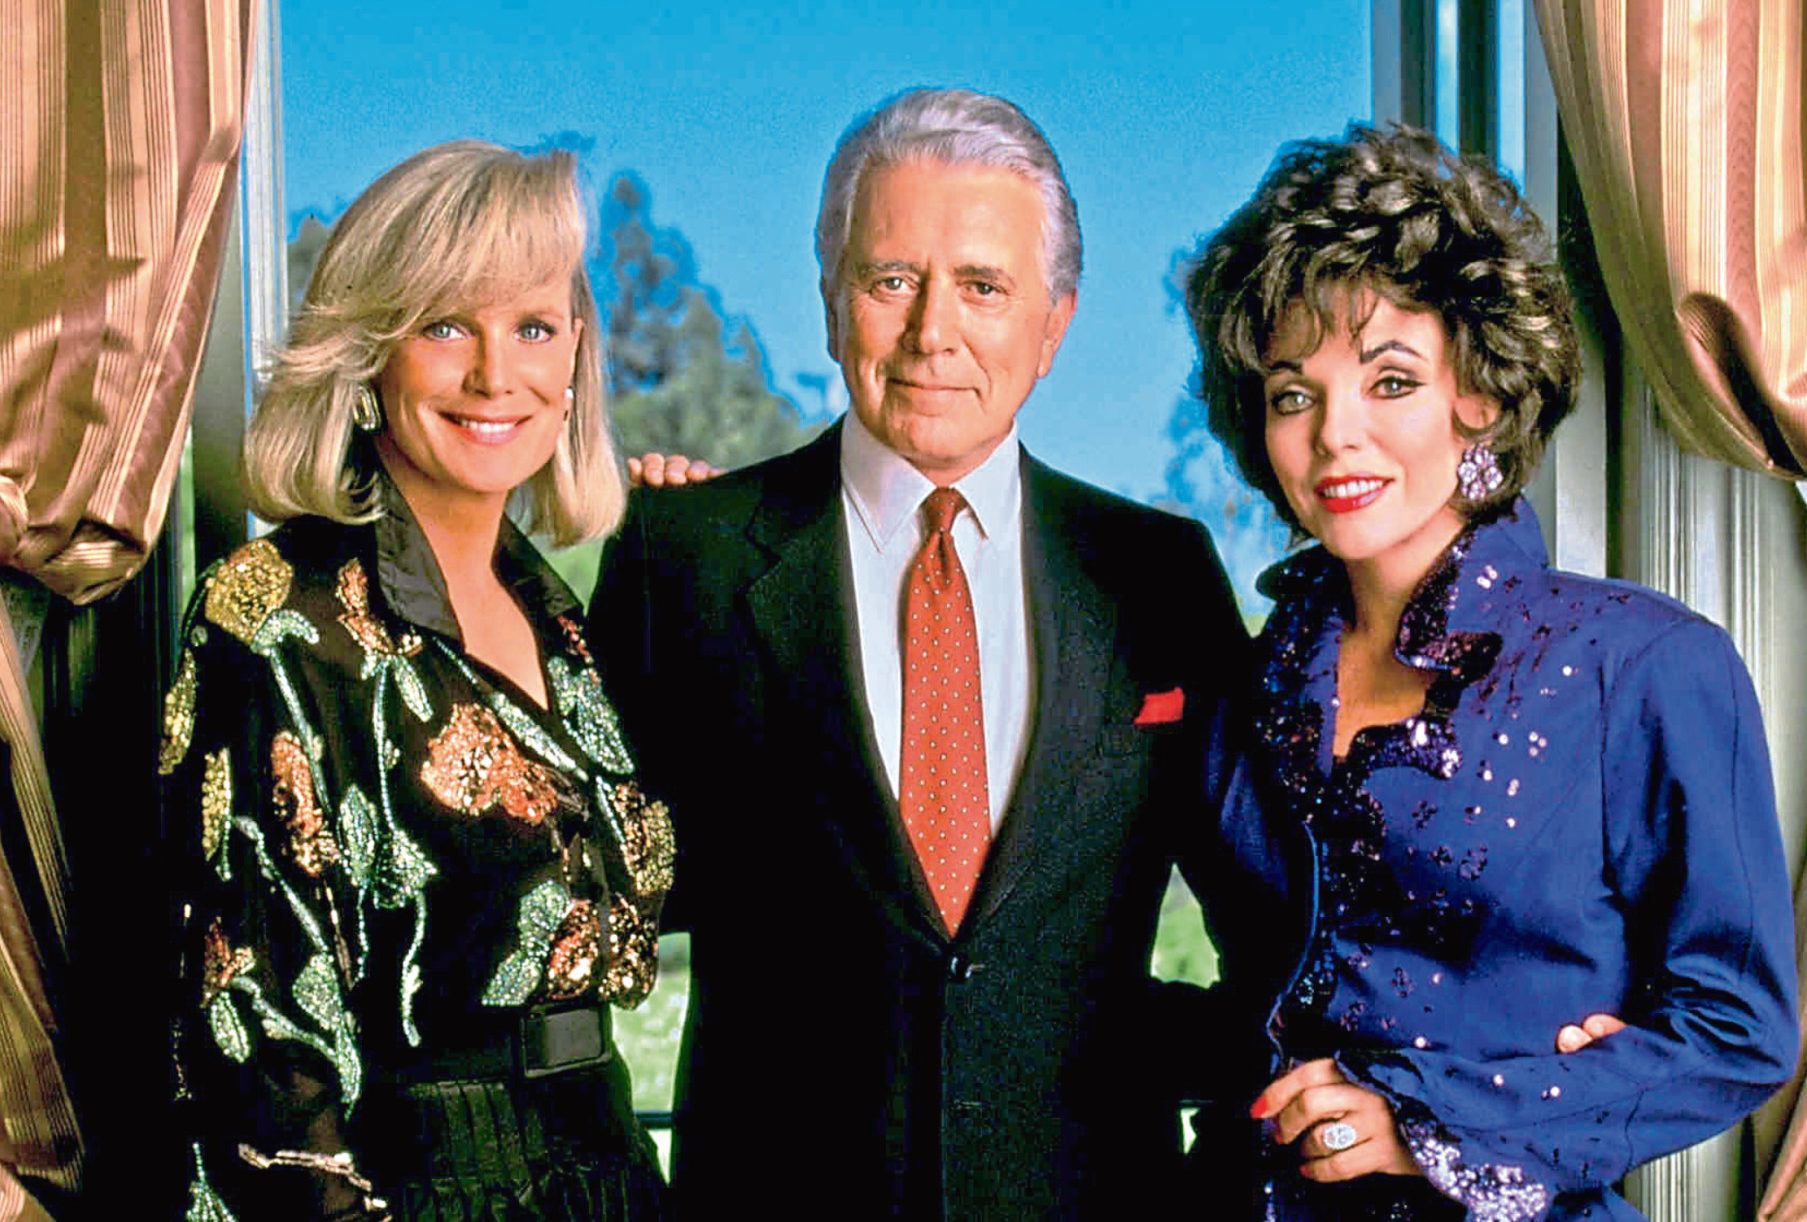 Linda Evans, John Forsythe and Joan Collins in Dynasty (Allstar/AARON SPELLING PROD.)